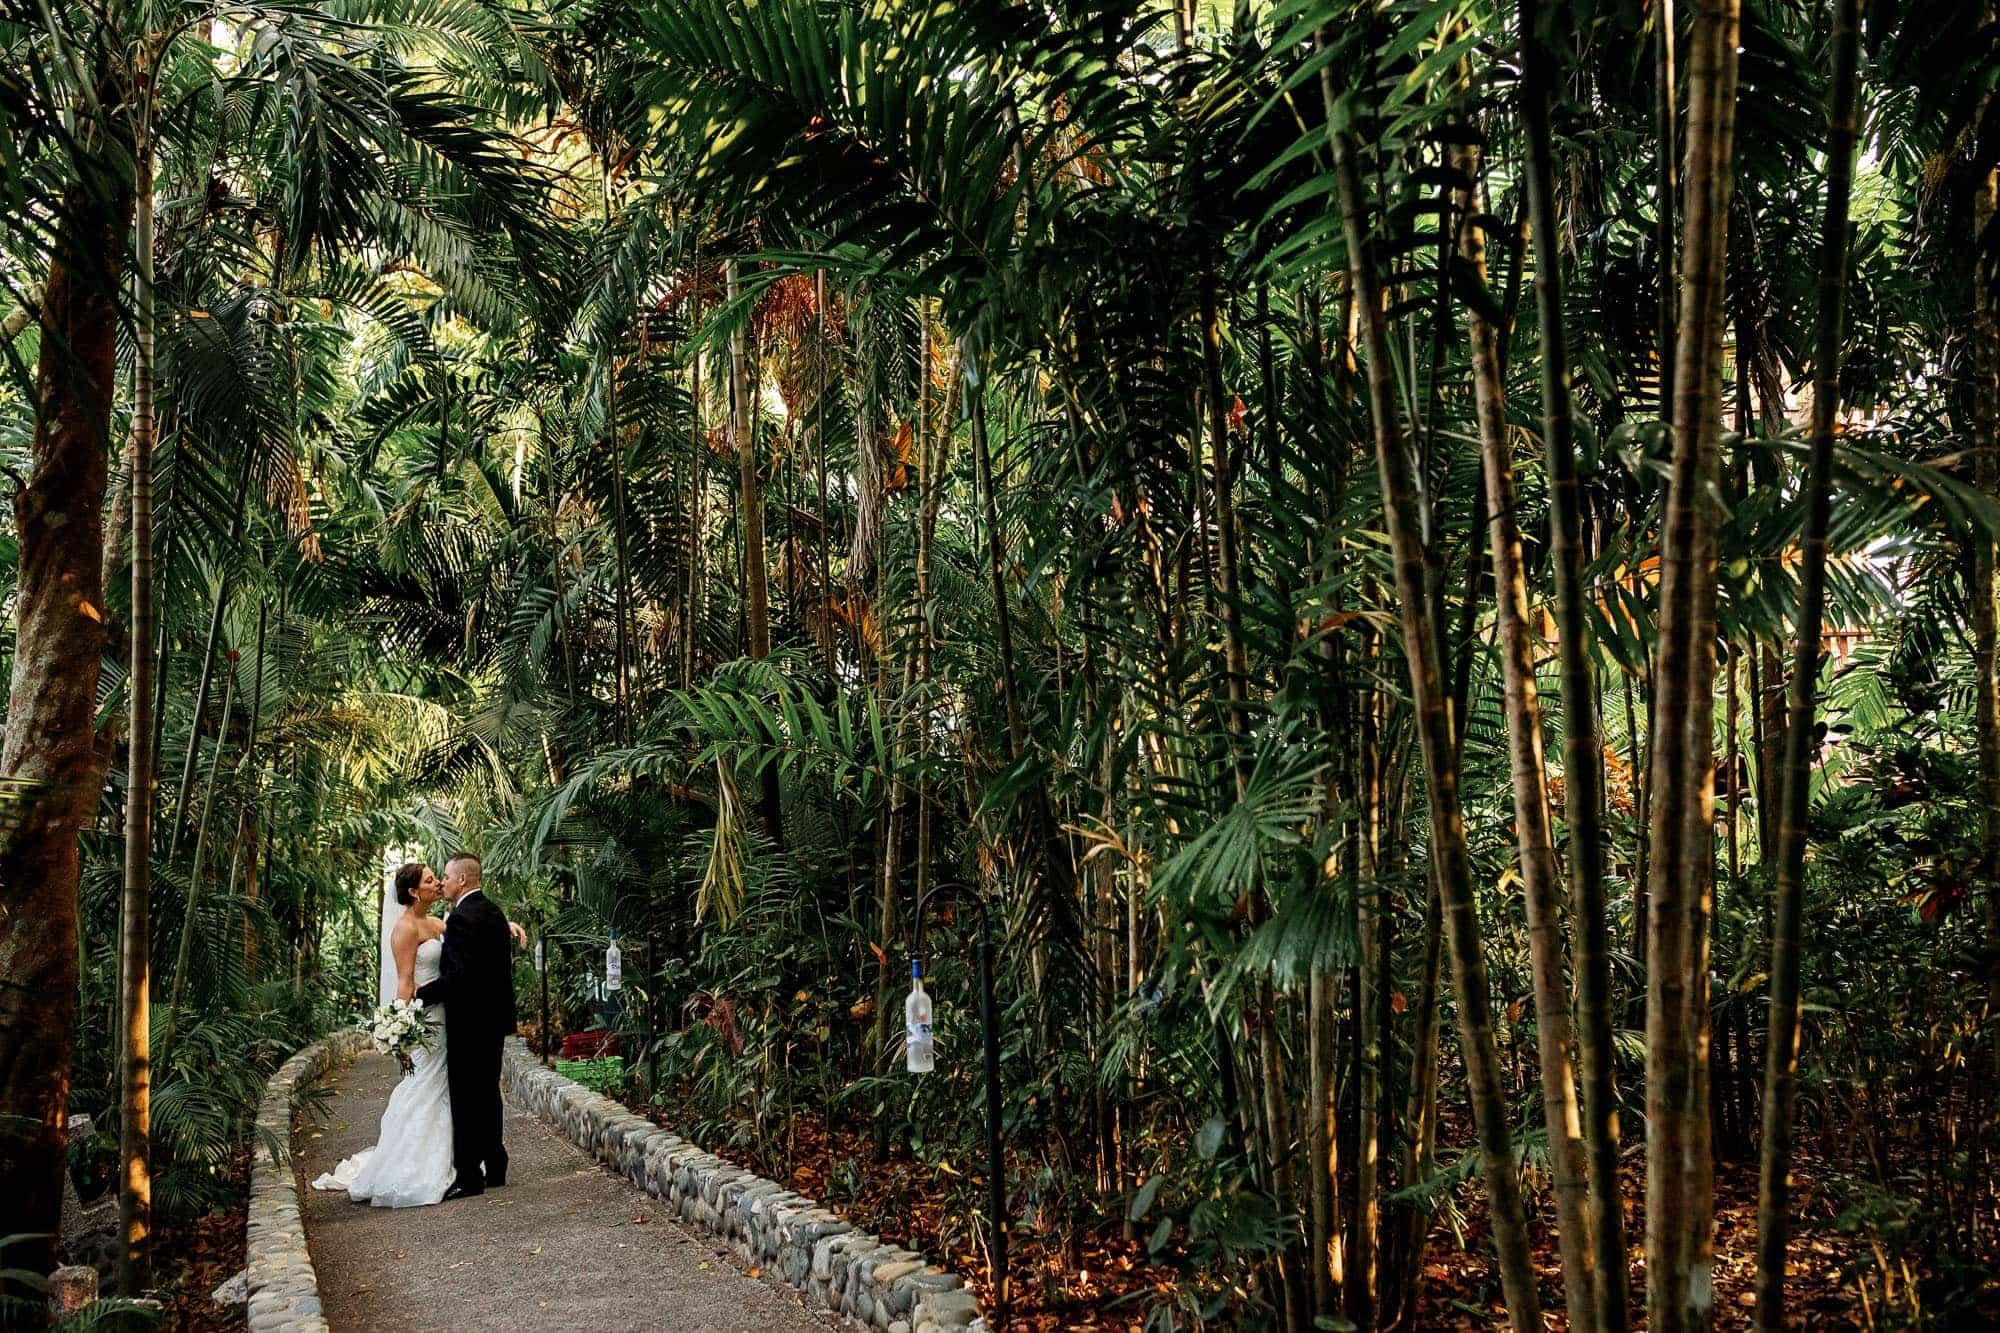 A formal wedding photo in Costa Verde. Costa Rica